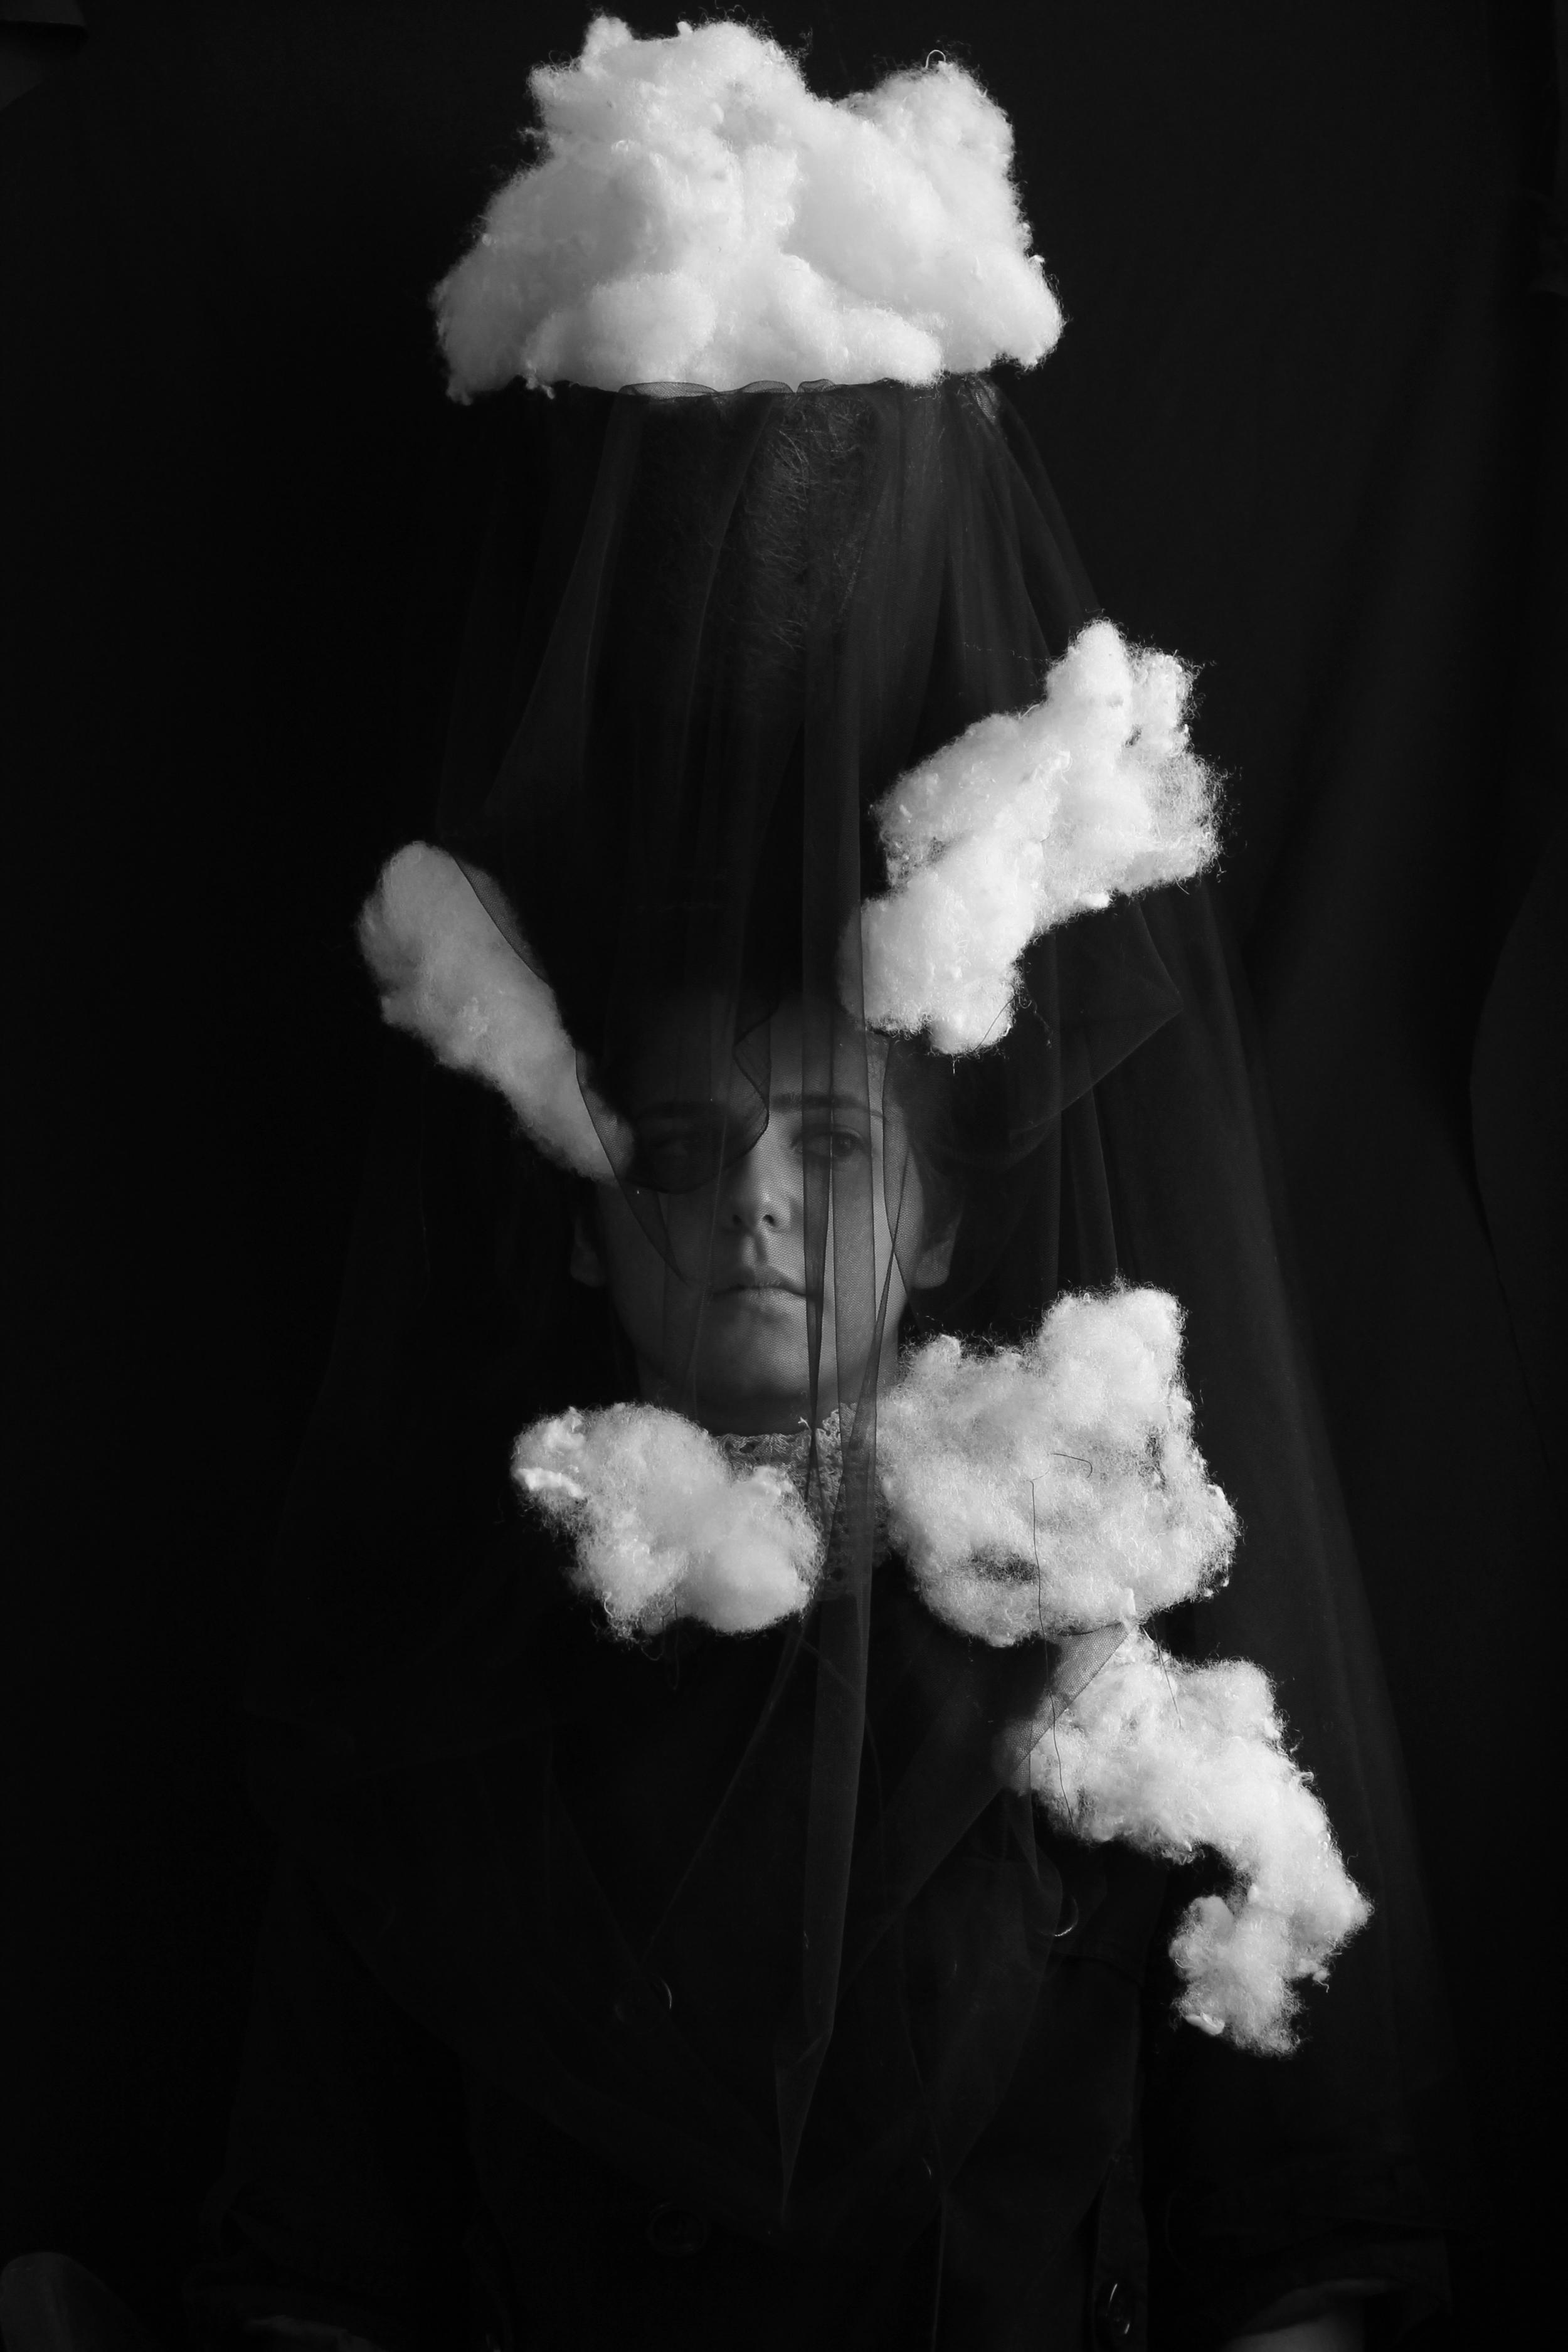 Queen-of-the-clouds.JPG